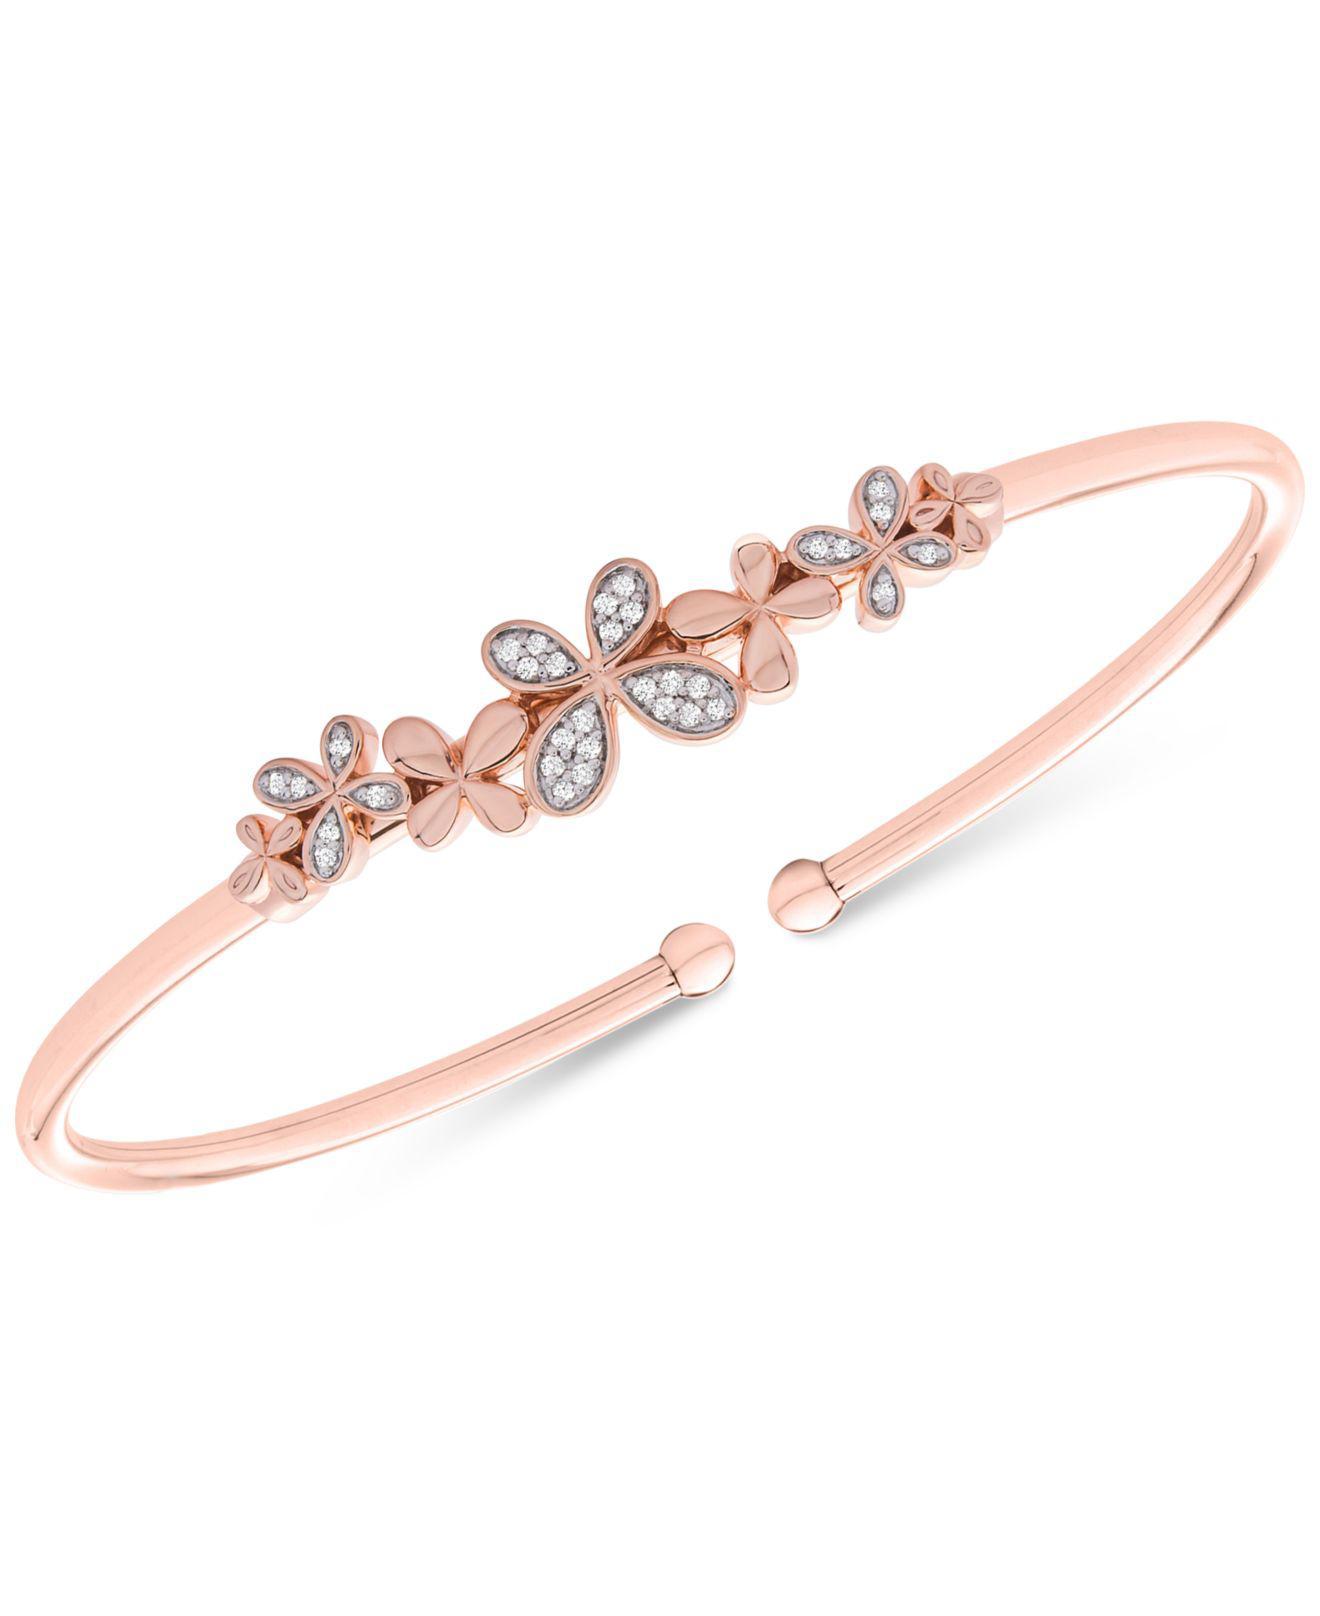 8b6d4af19e0 Wrapped in Love. Women's Tm Diamond Butterfly Flexie Bangle Bracelet (1/6  Ct. T.w.) In 14k Rose Gold-plated Sterling Silver ...